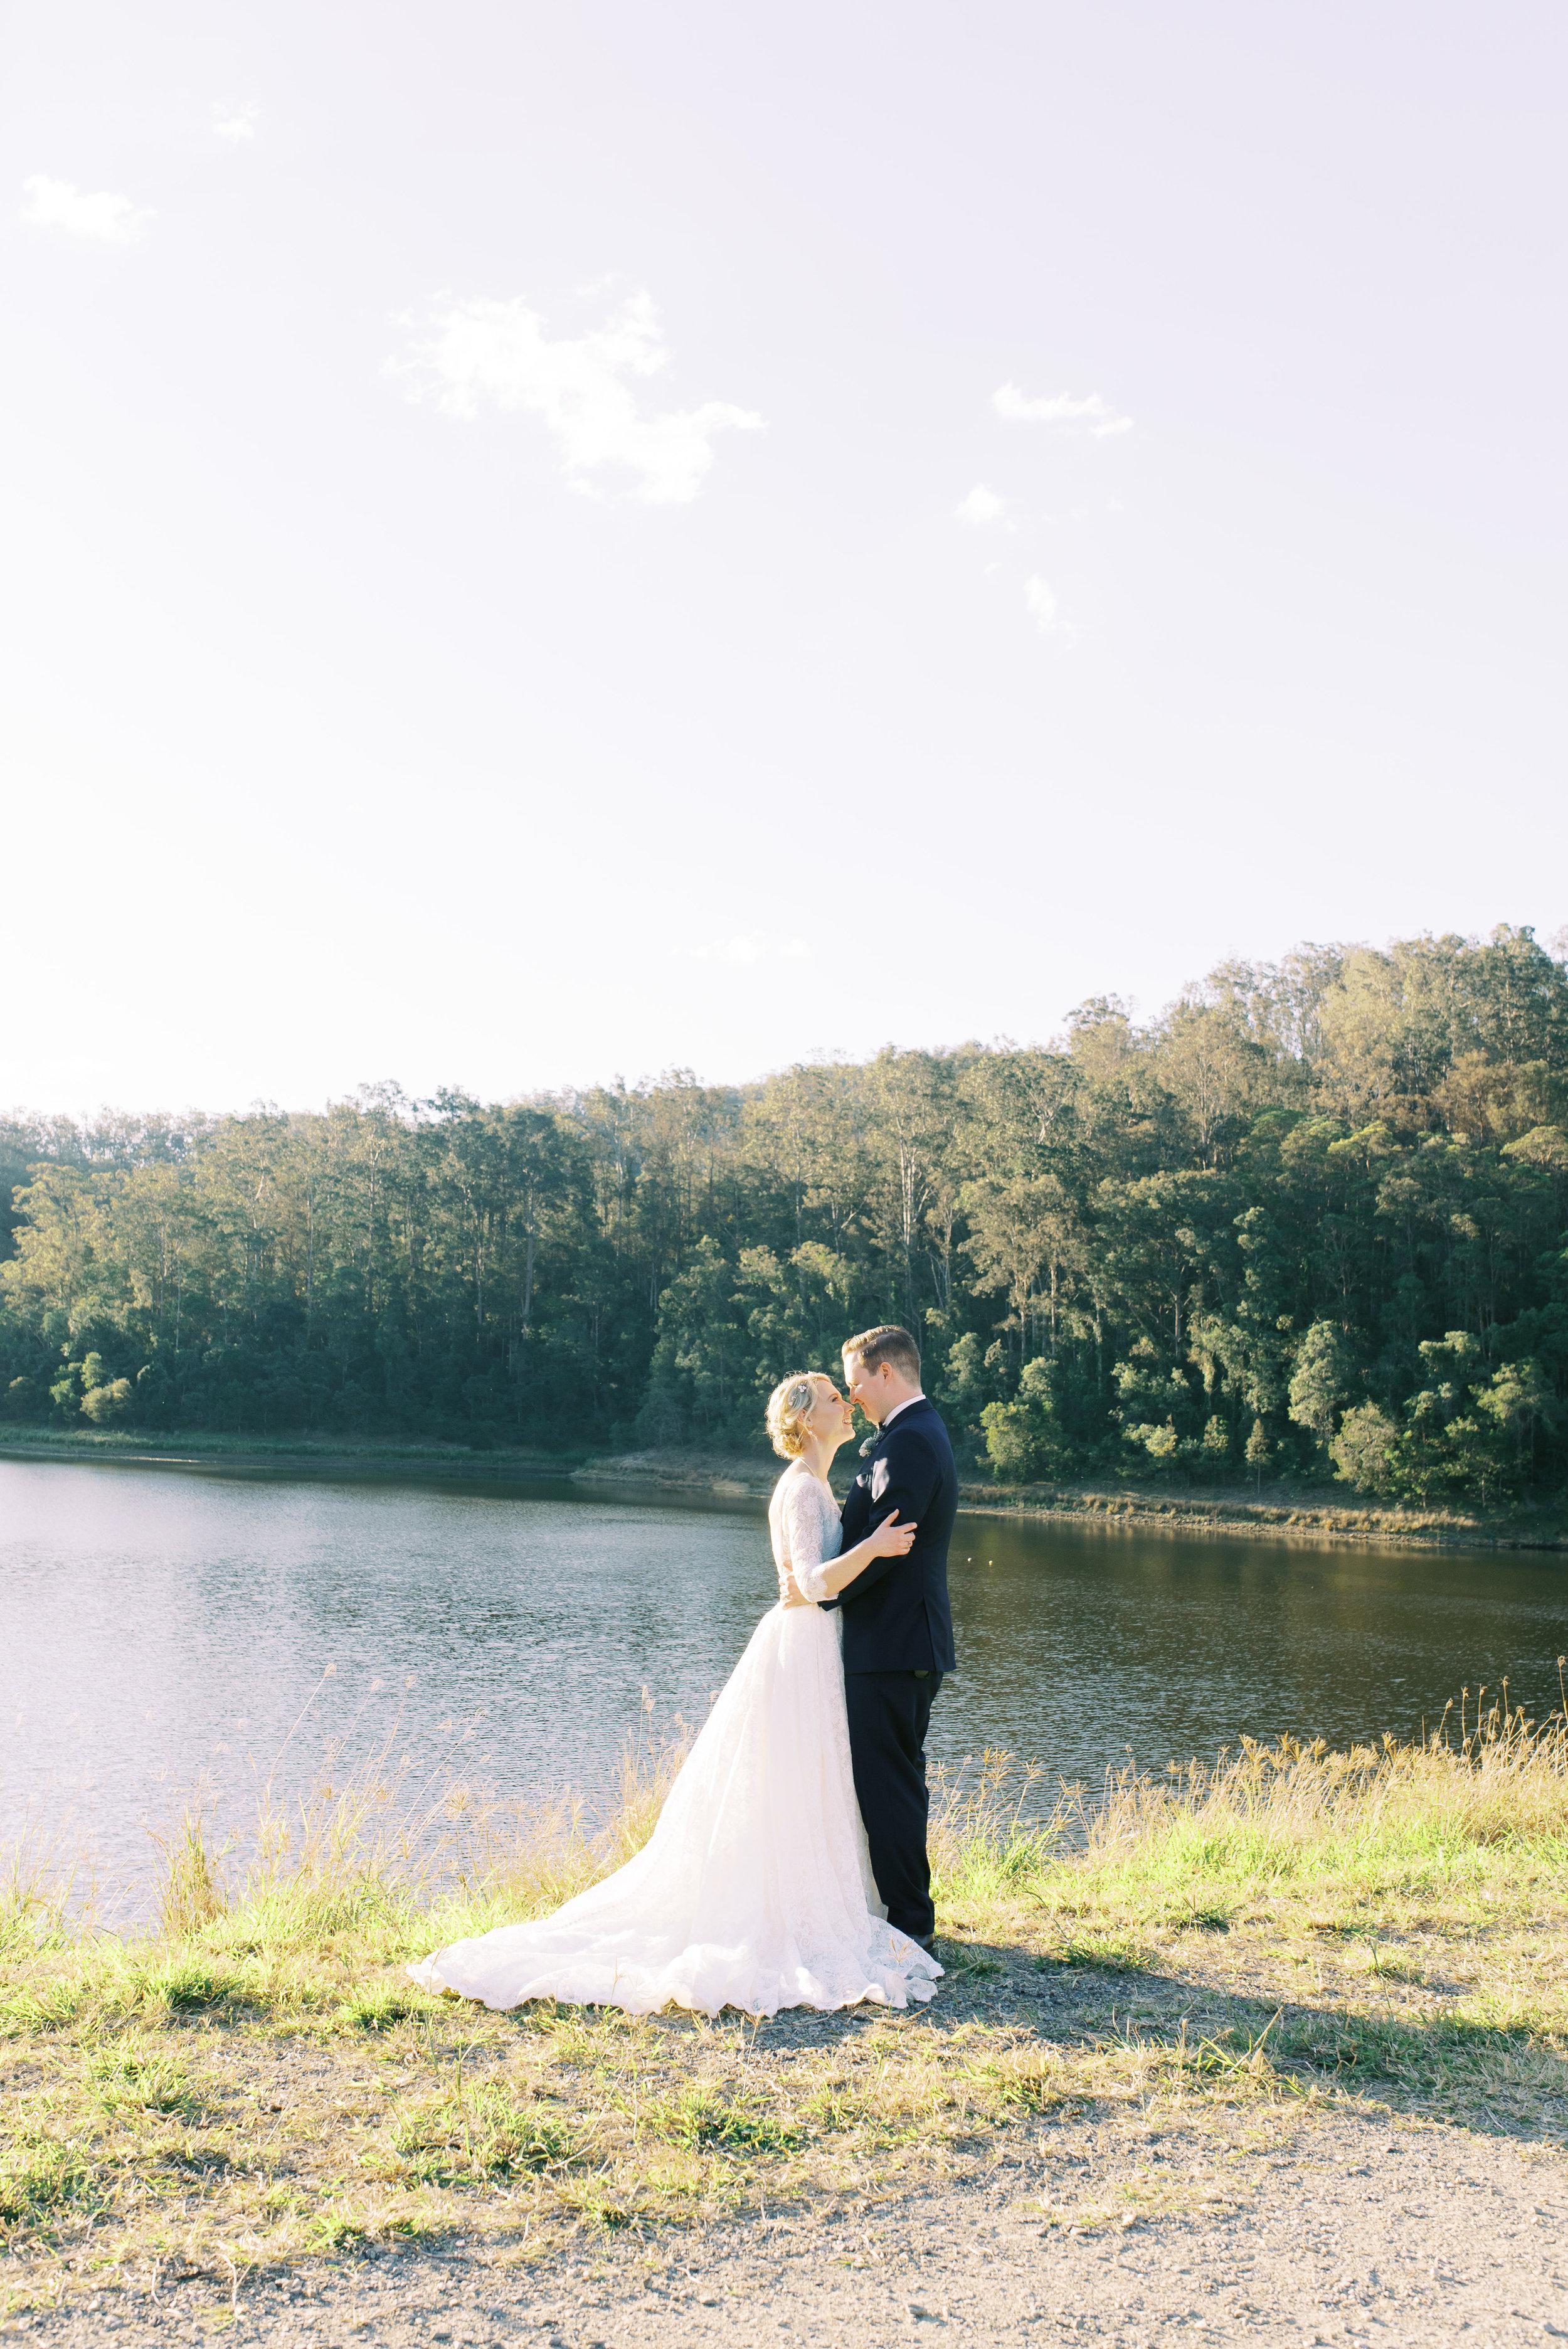 brisbane-gold-coast-sunshine-coast-tweed-romantic-fine-art-wedding-photography-lauren-olivia-42.jpg